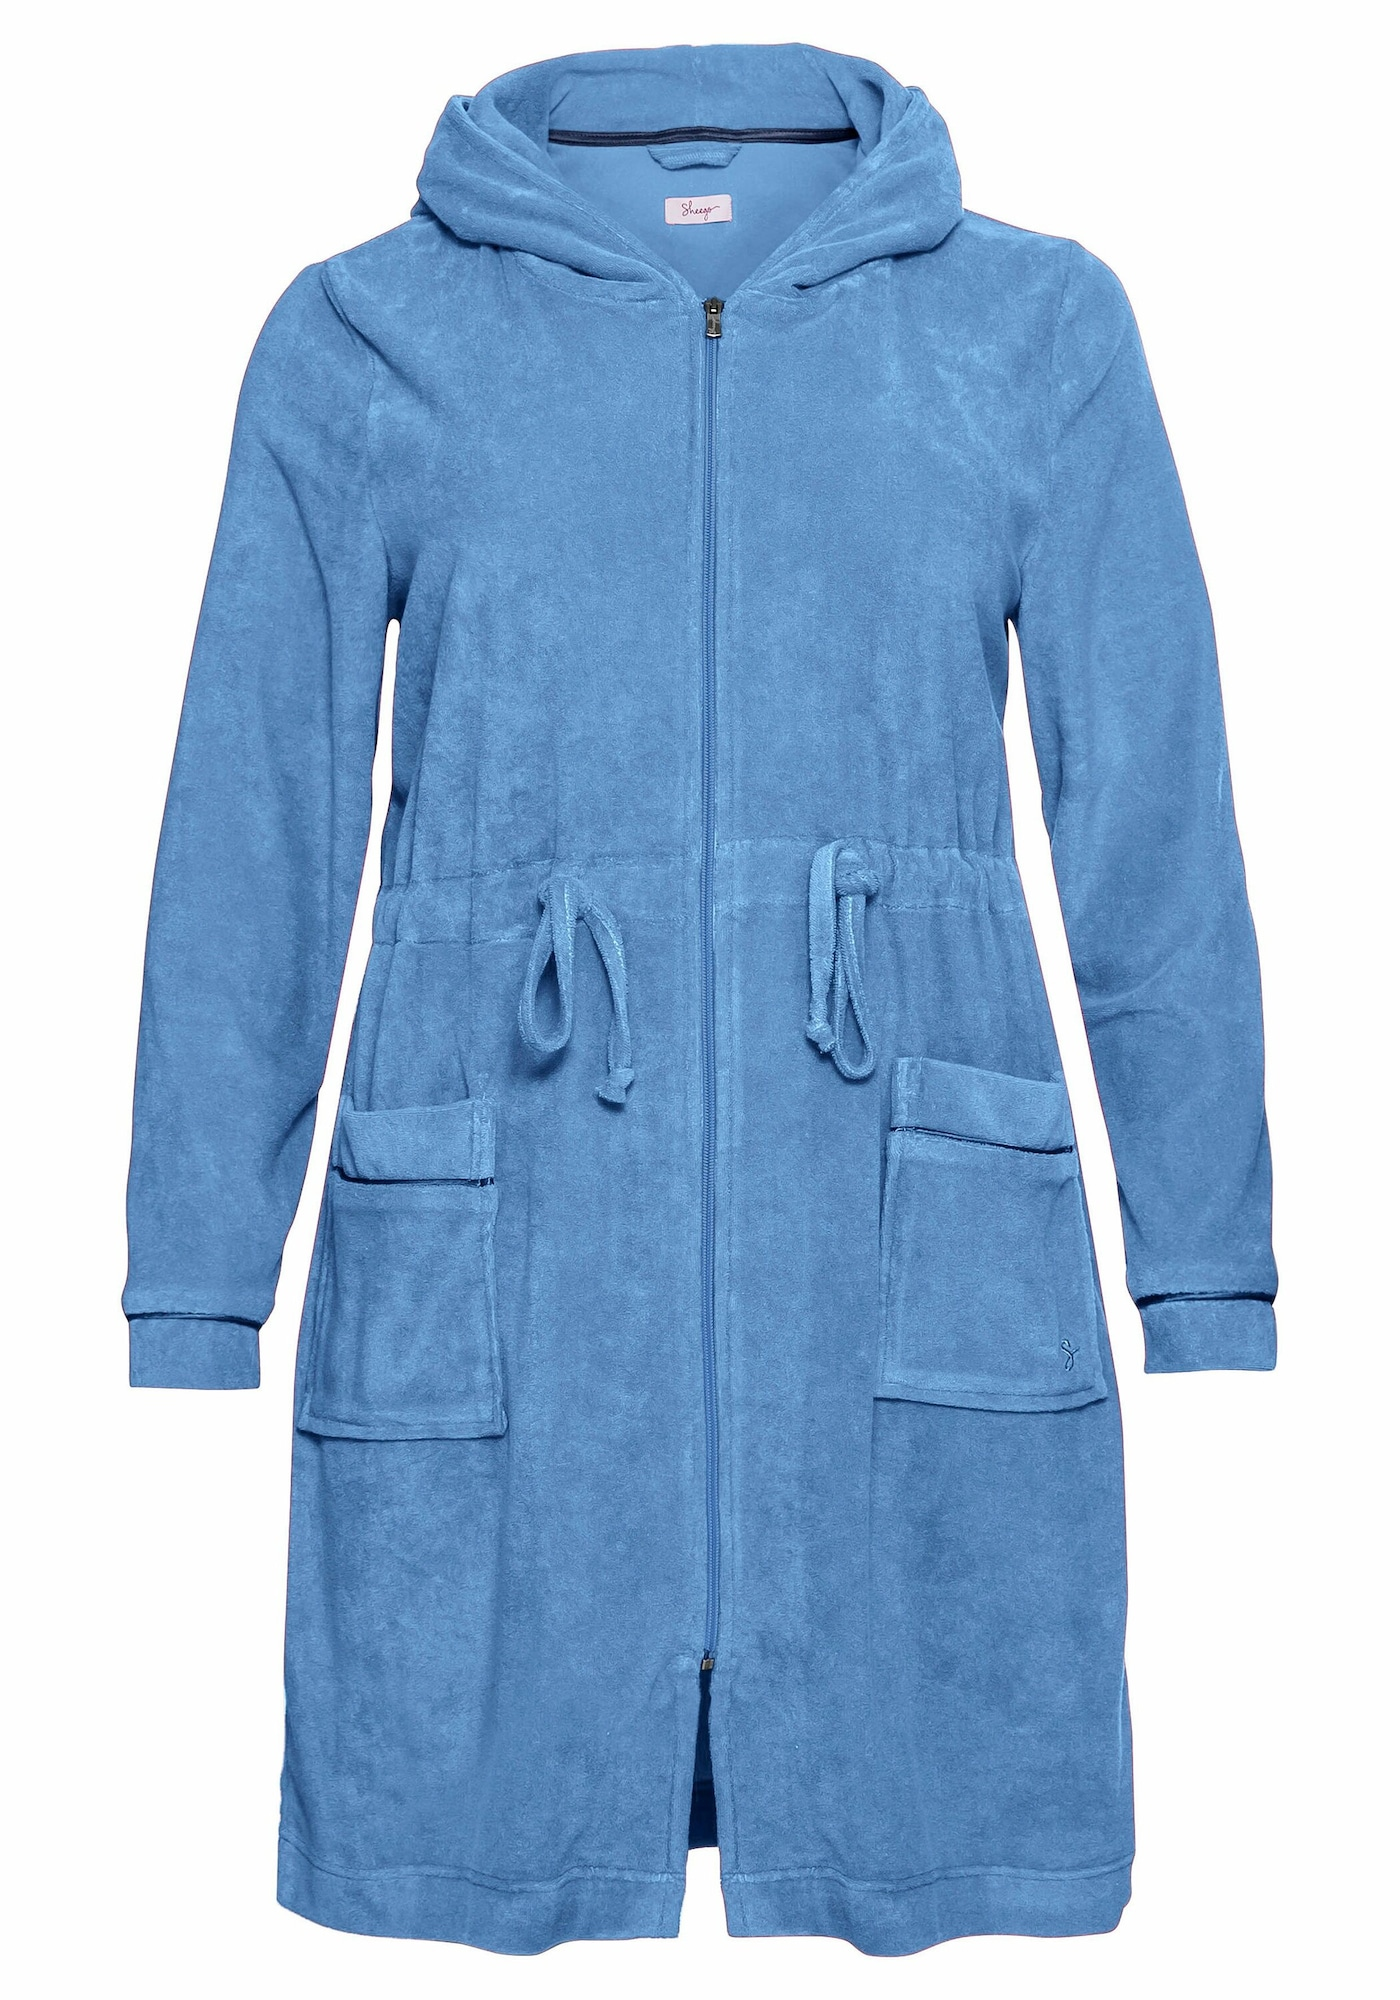 SHEEGO Trumpas vonios chalatas mėlyna